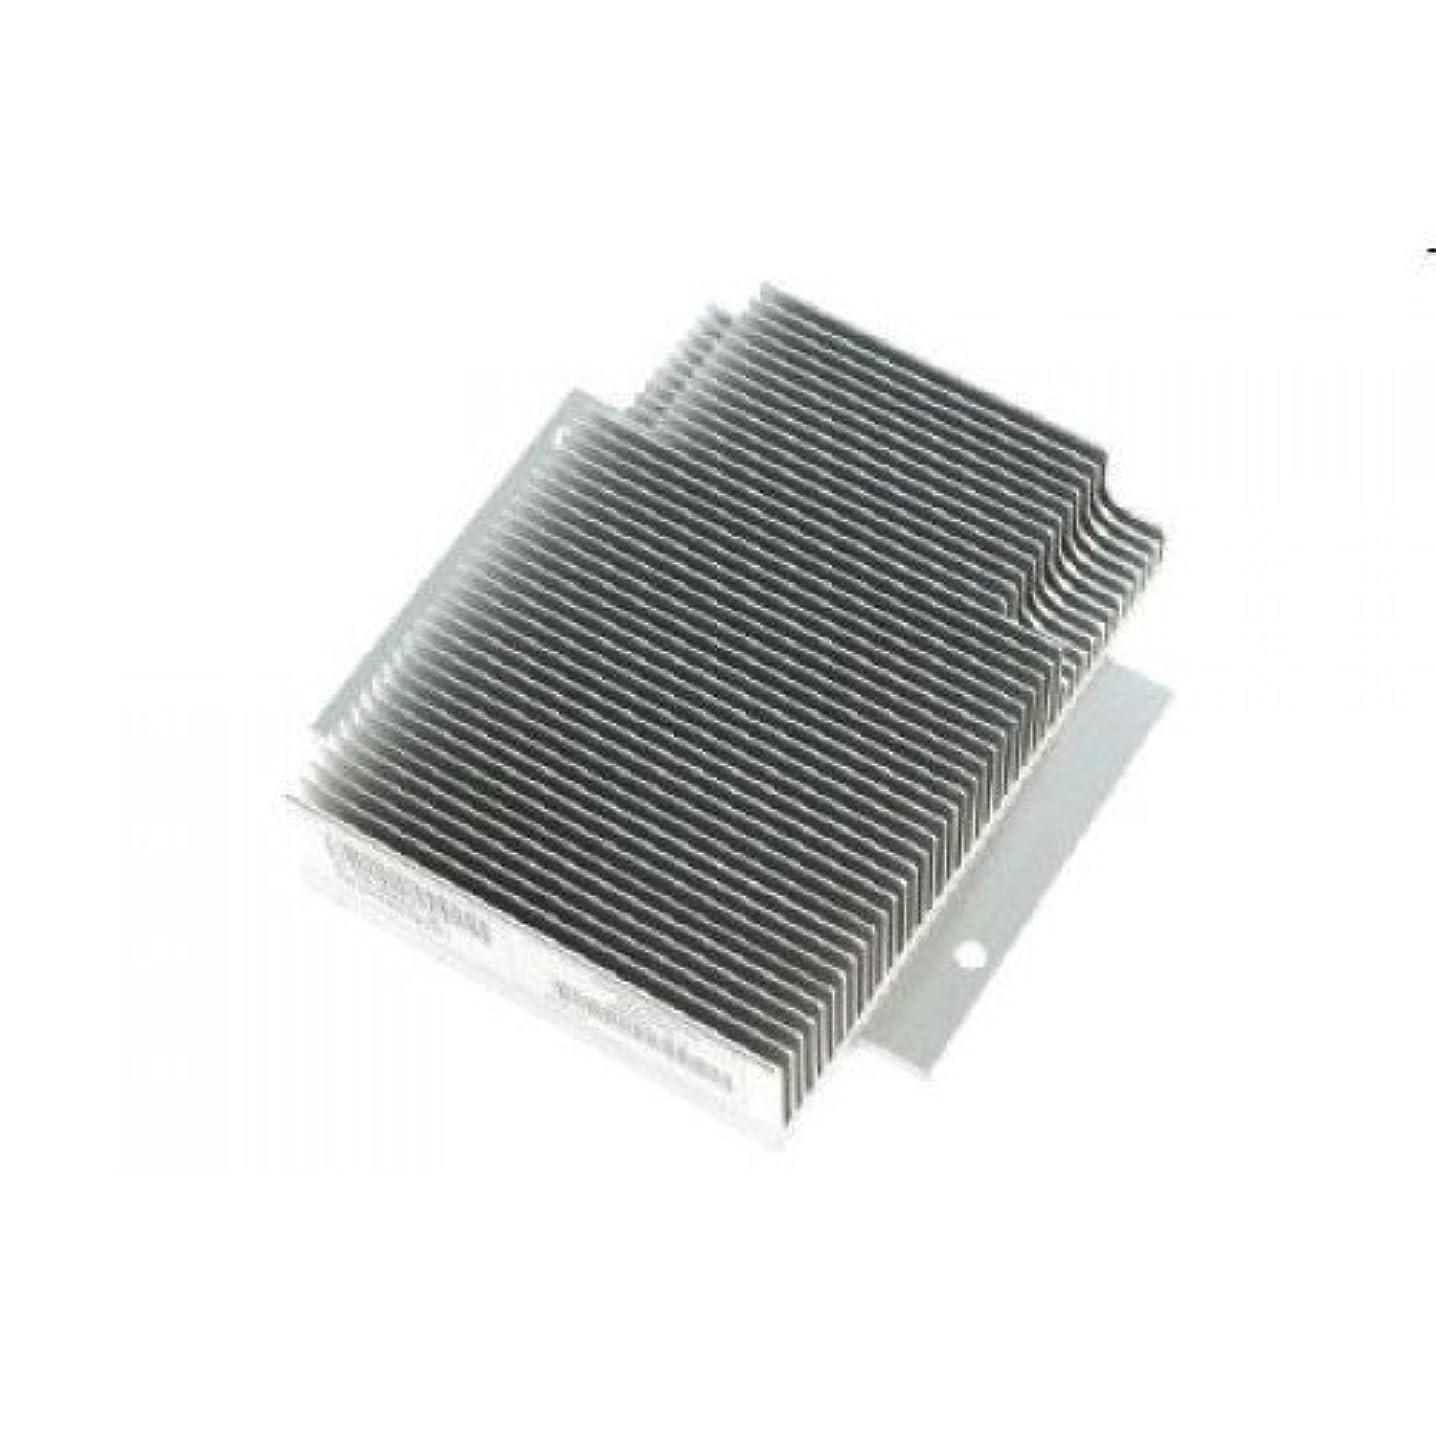 HP 507672-001 Dl360 G6 Heatsink